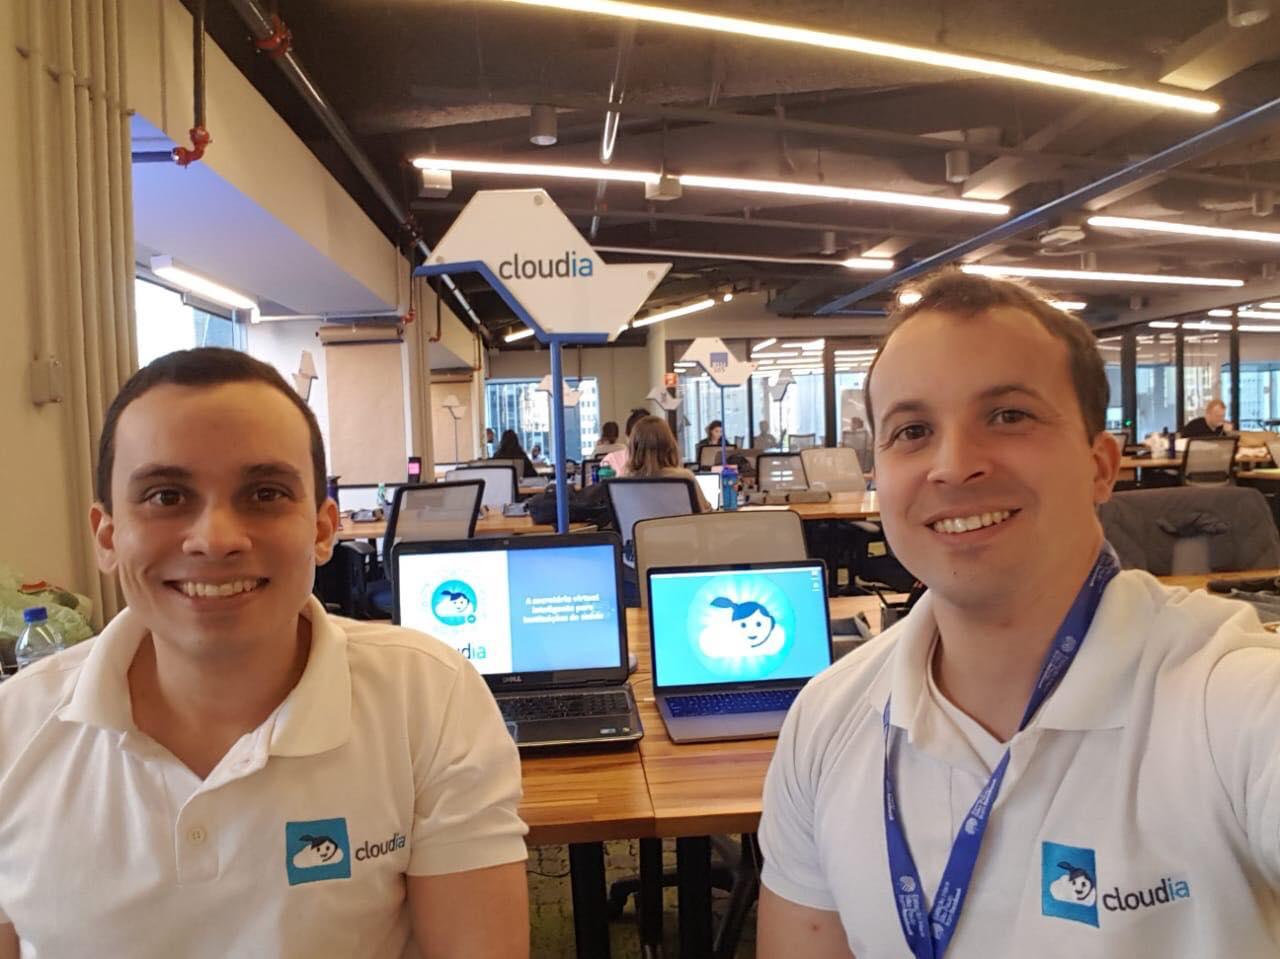 Startup potiguar é selecionada dentre 1000 empresas para curso do Facebook